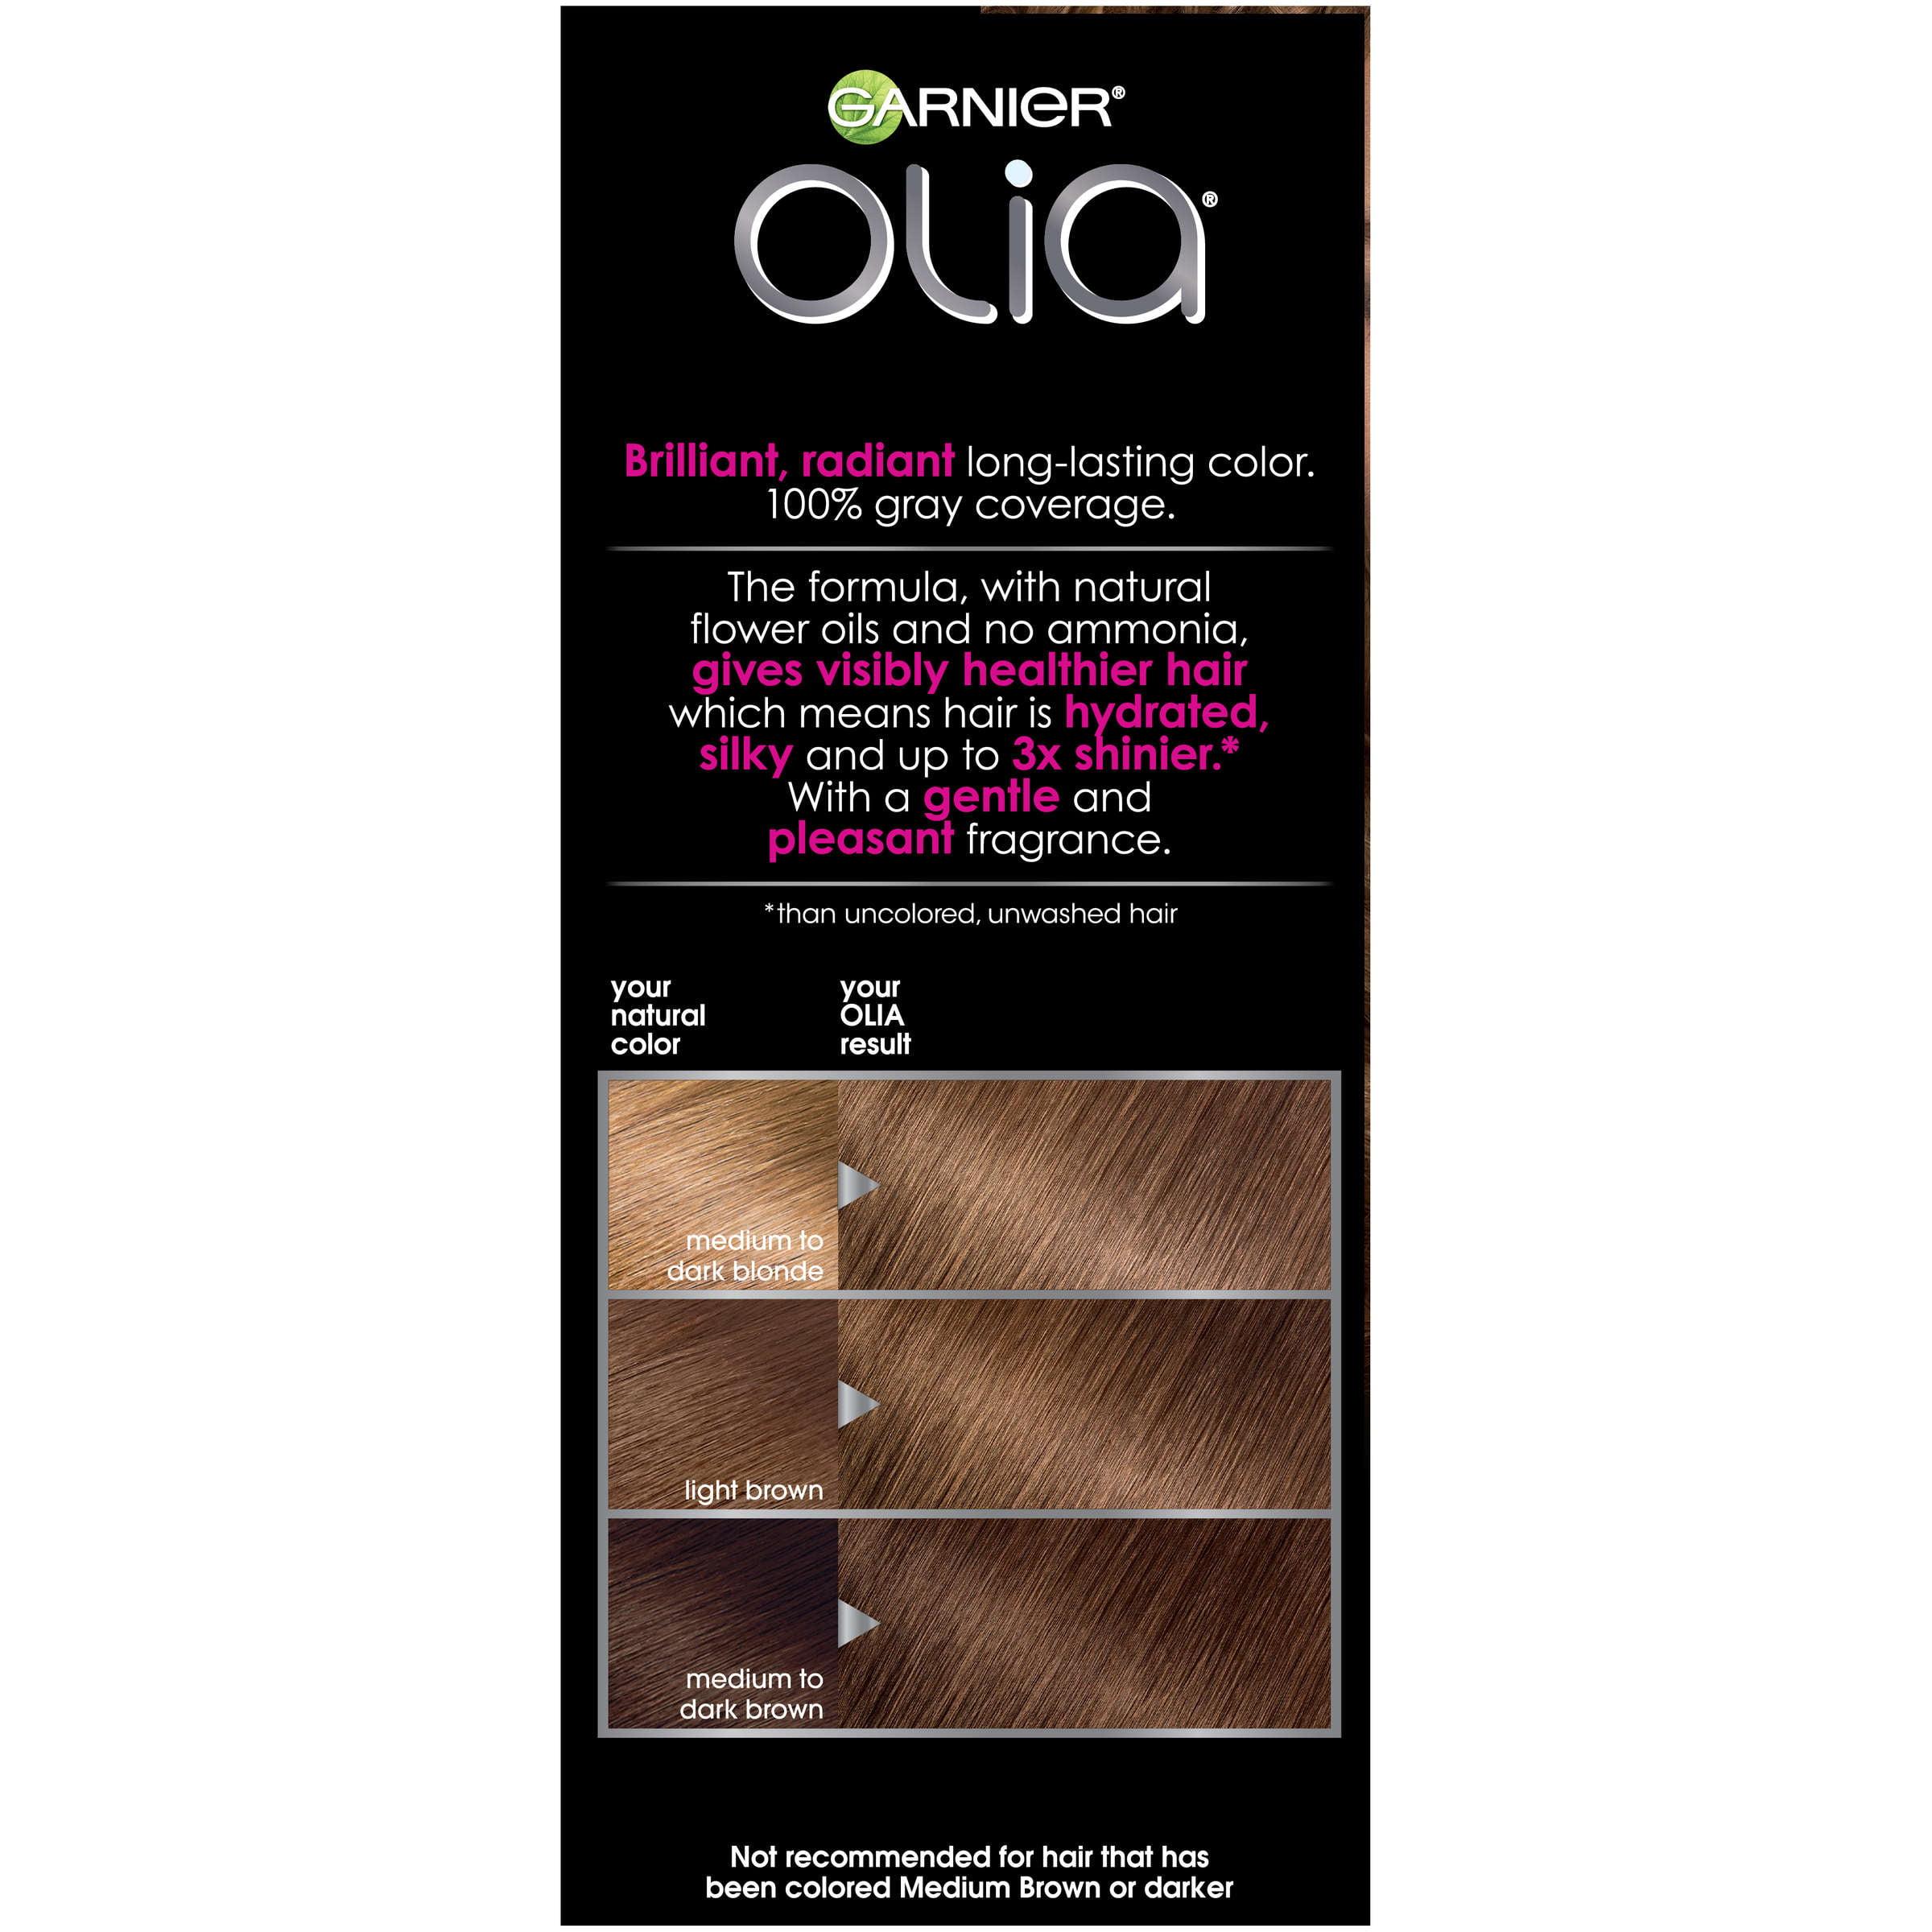 Garnier Olia Oil Powered Permanent Hair Color 60 Light Brown